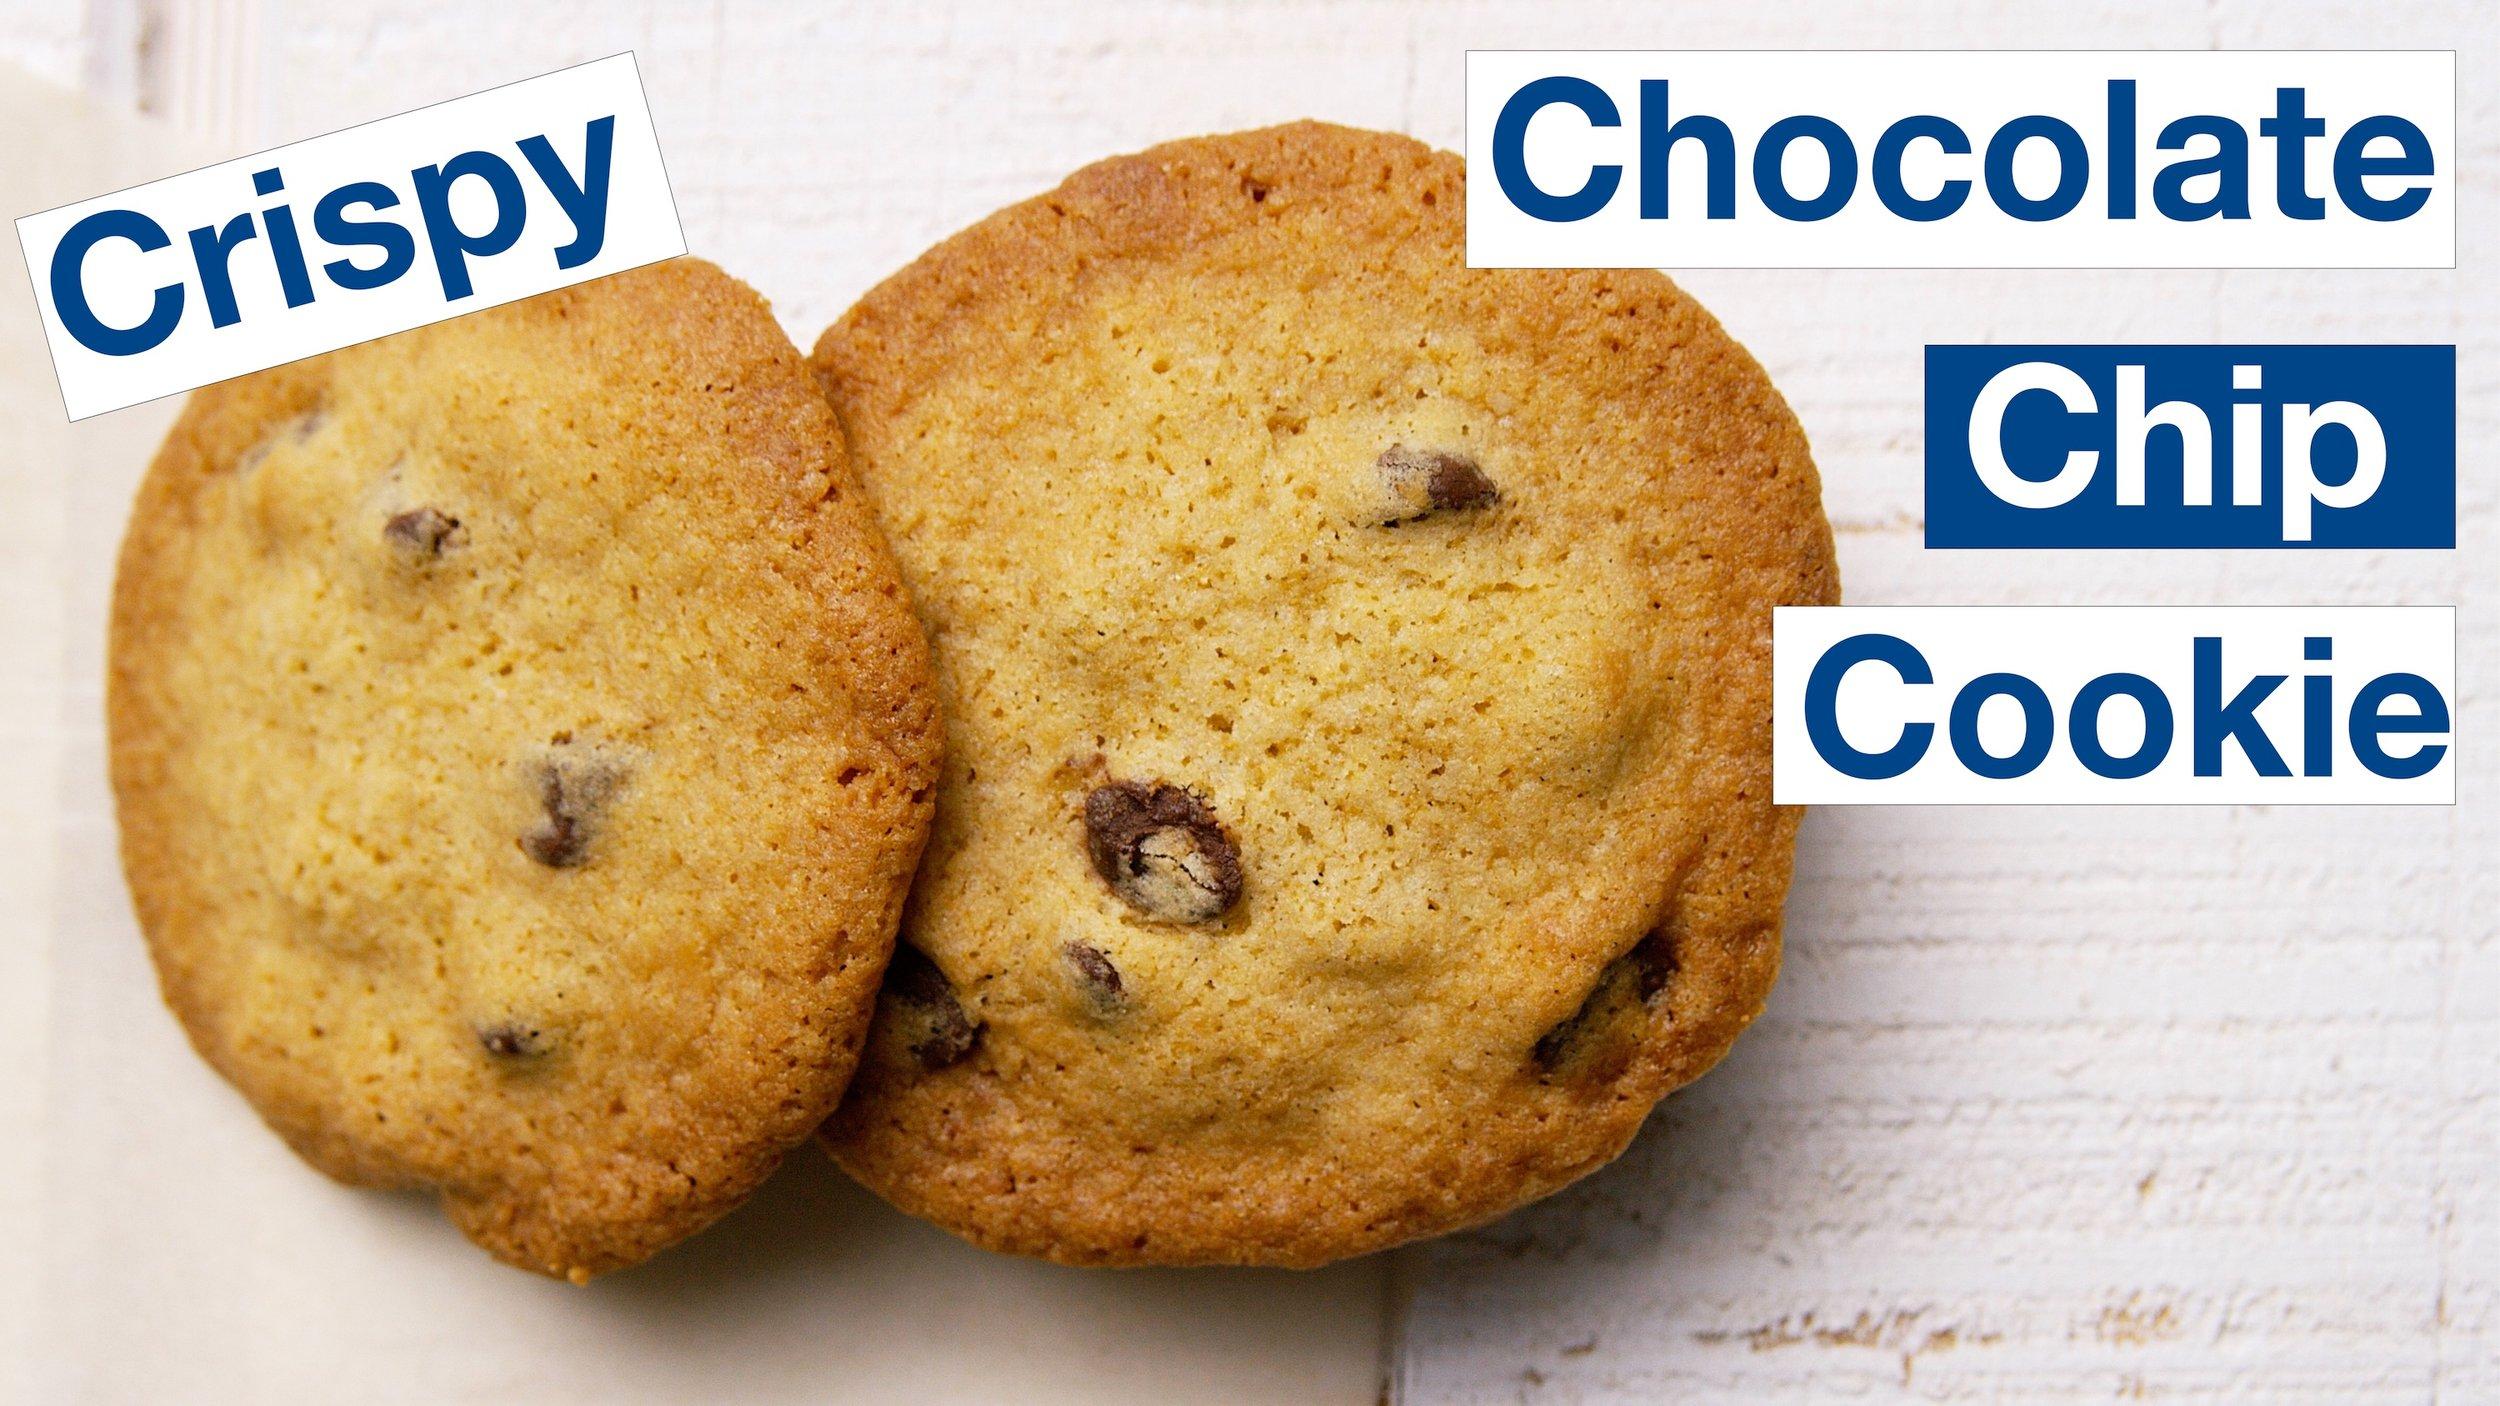 Buttery Crispy Chocolate Chip Cookie recipe.jpg